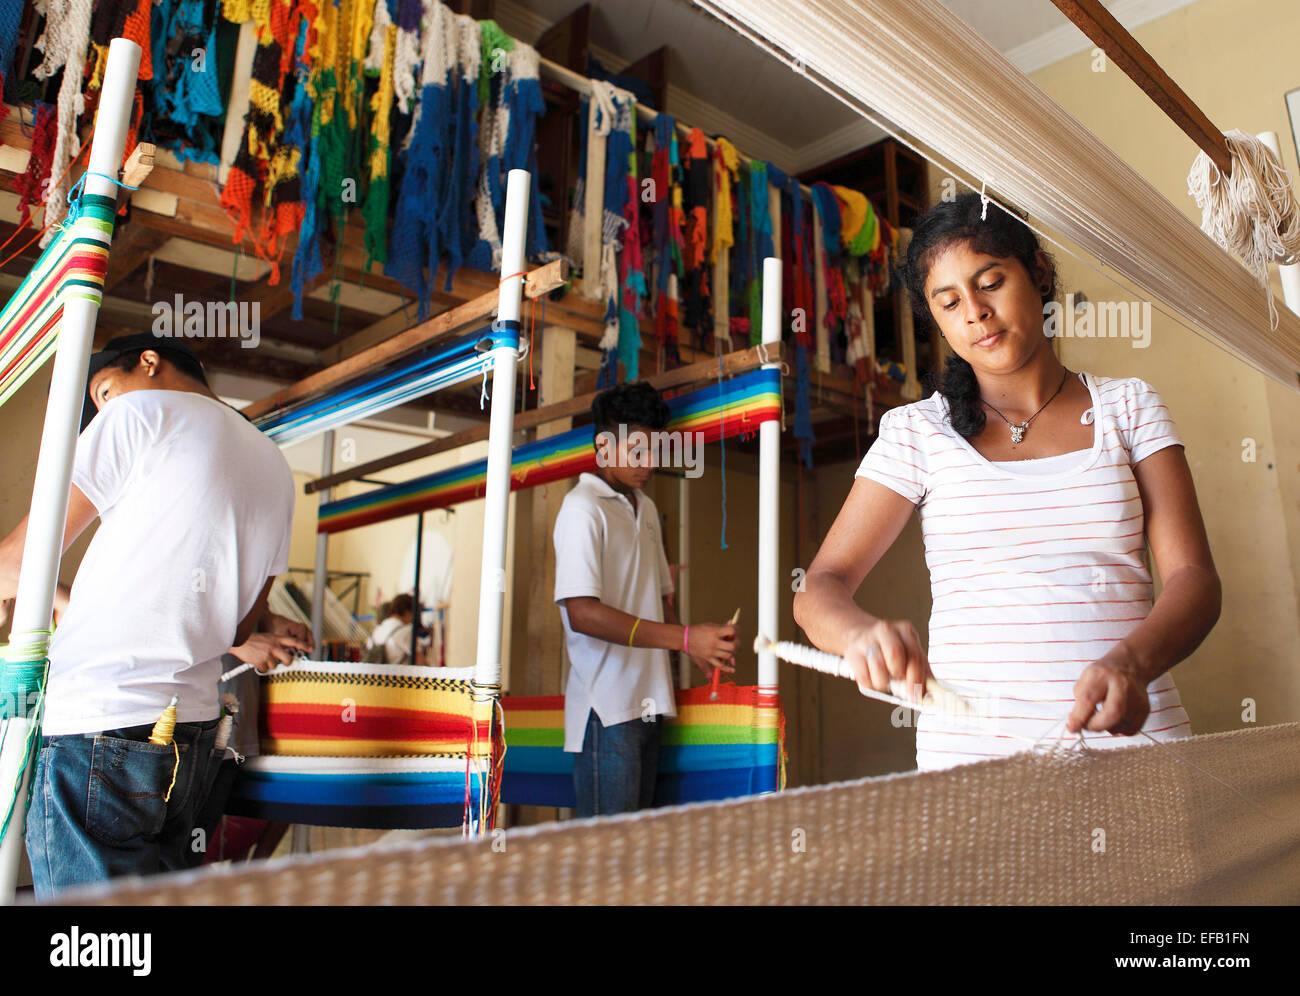 Woman and men weaving hammocks by hand, Granada, province of Granada, Nicaragua - Stock Image